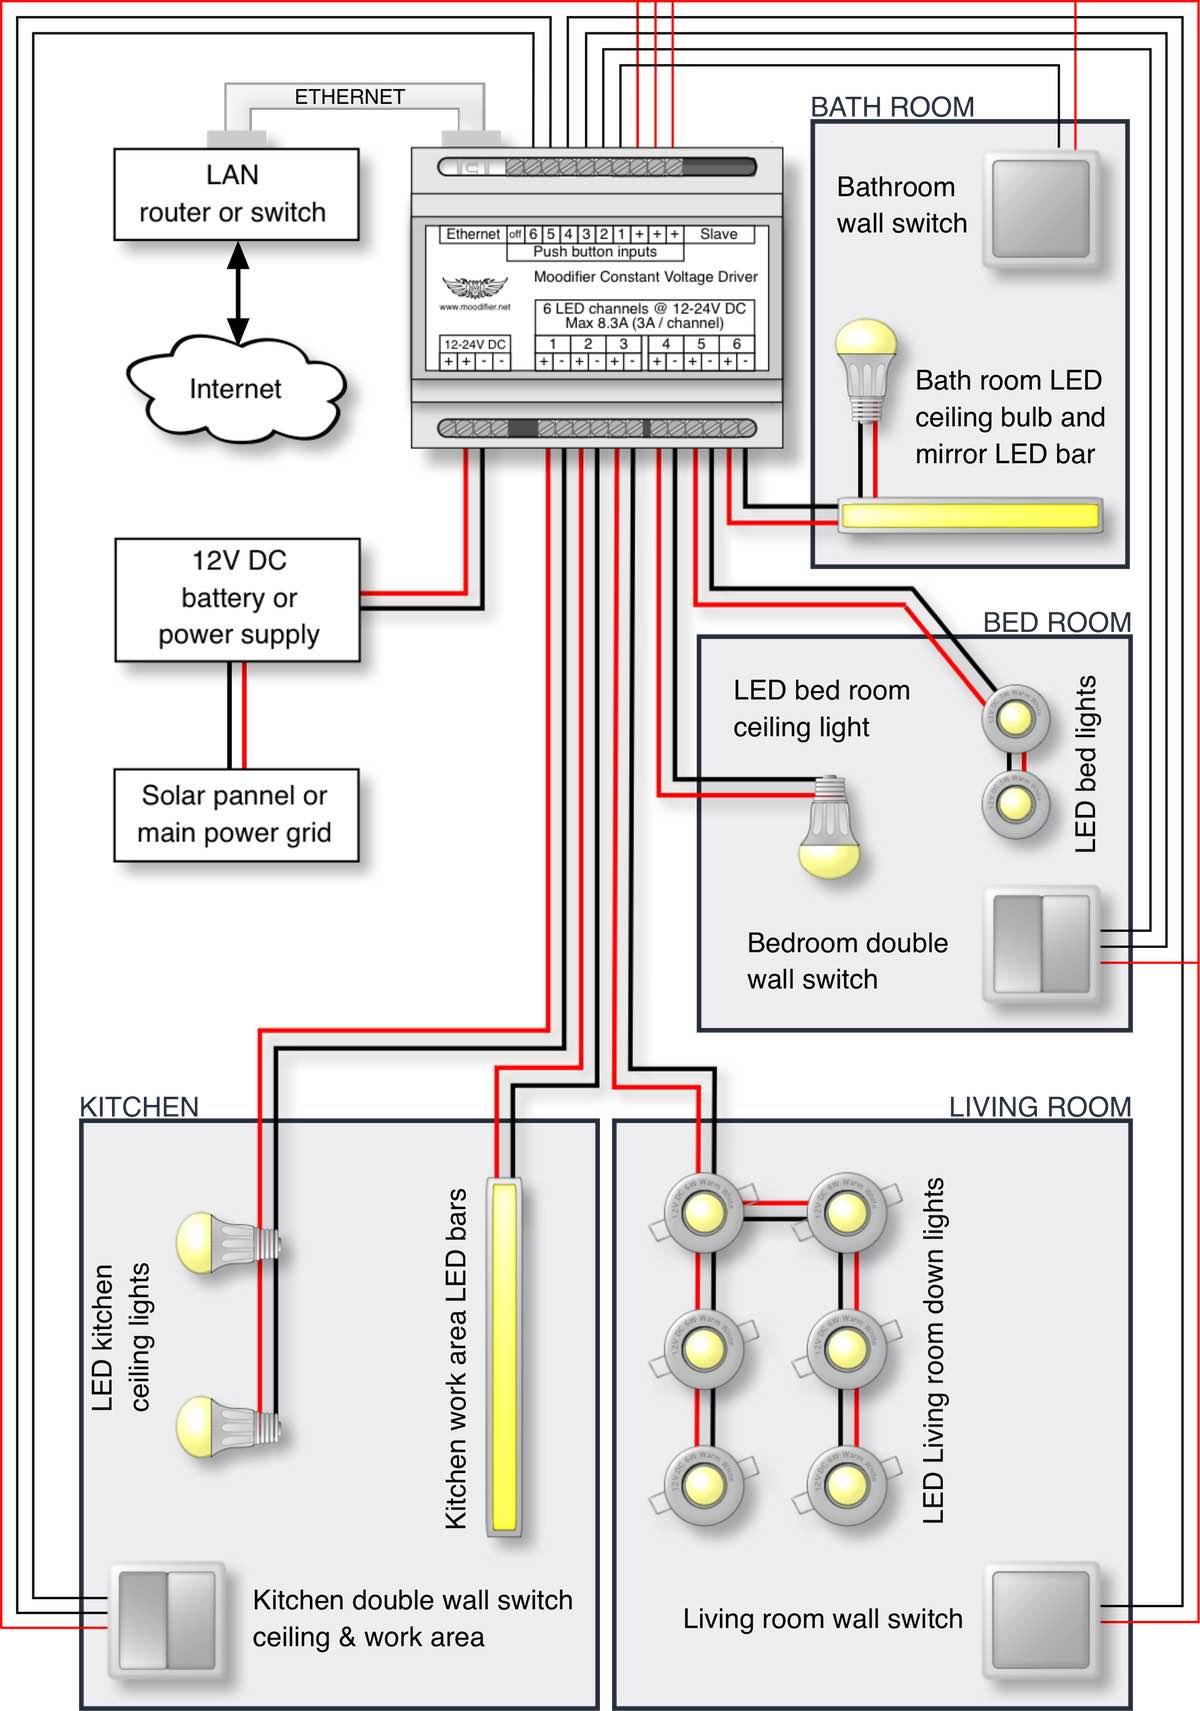 kitchen light wiring diagram 7 pin relay 12 24v dc moodifier led lighting installation white paper